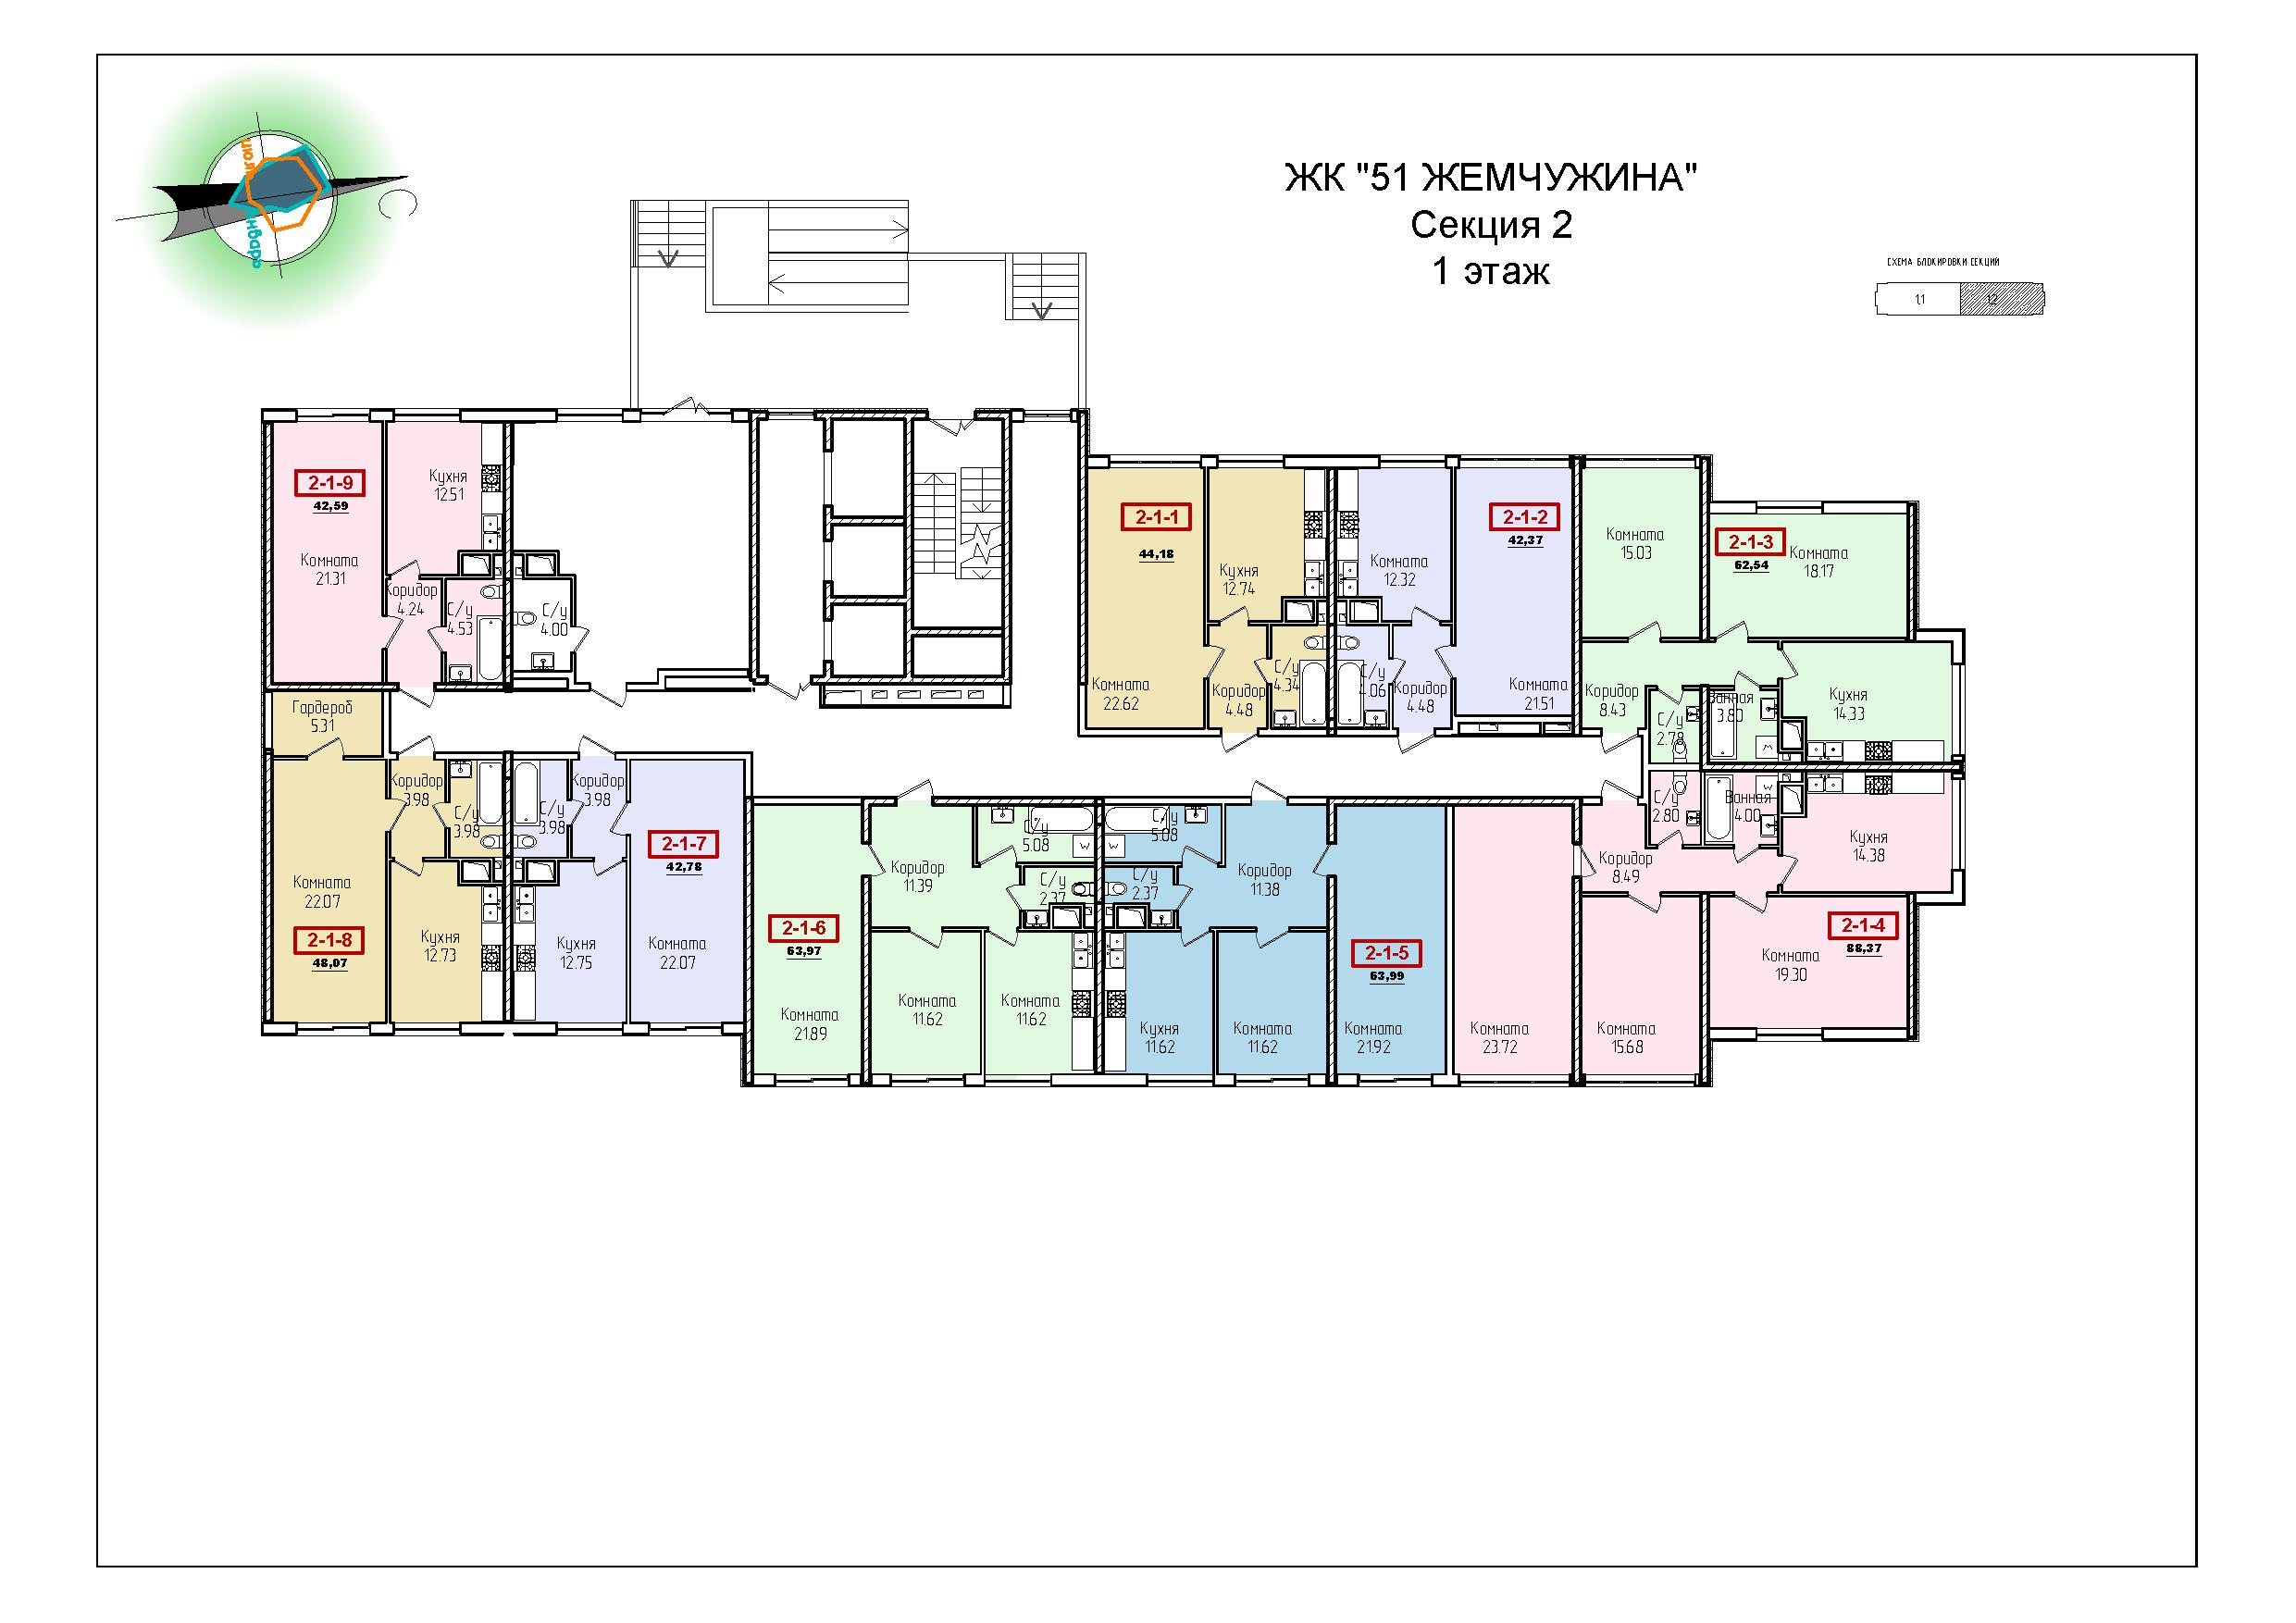 ЖК 51 Жемчужина 2 секция план 1 этажа